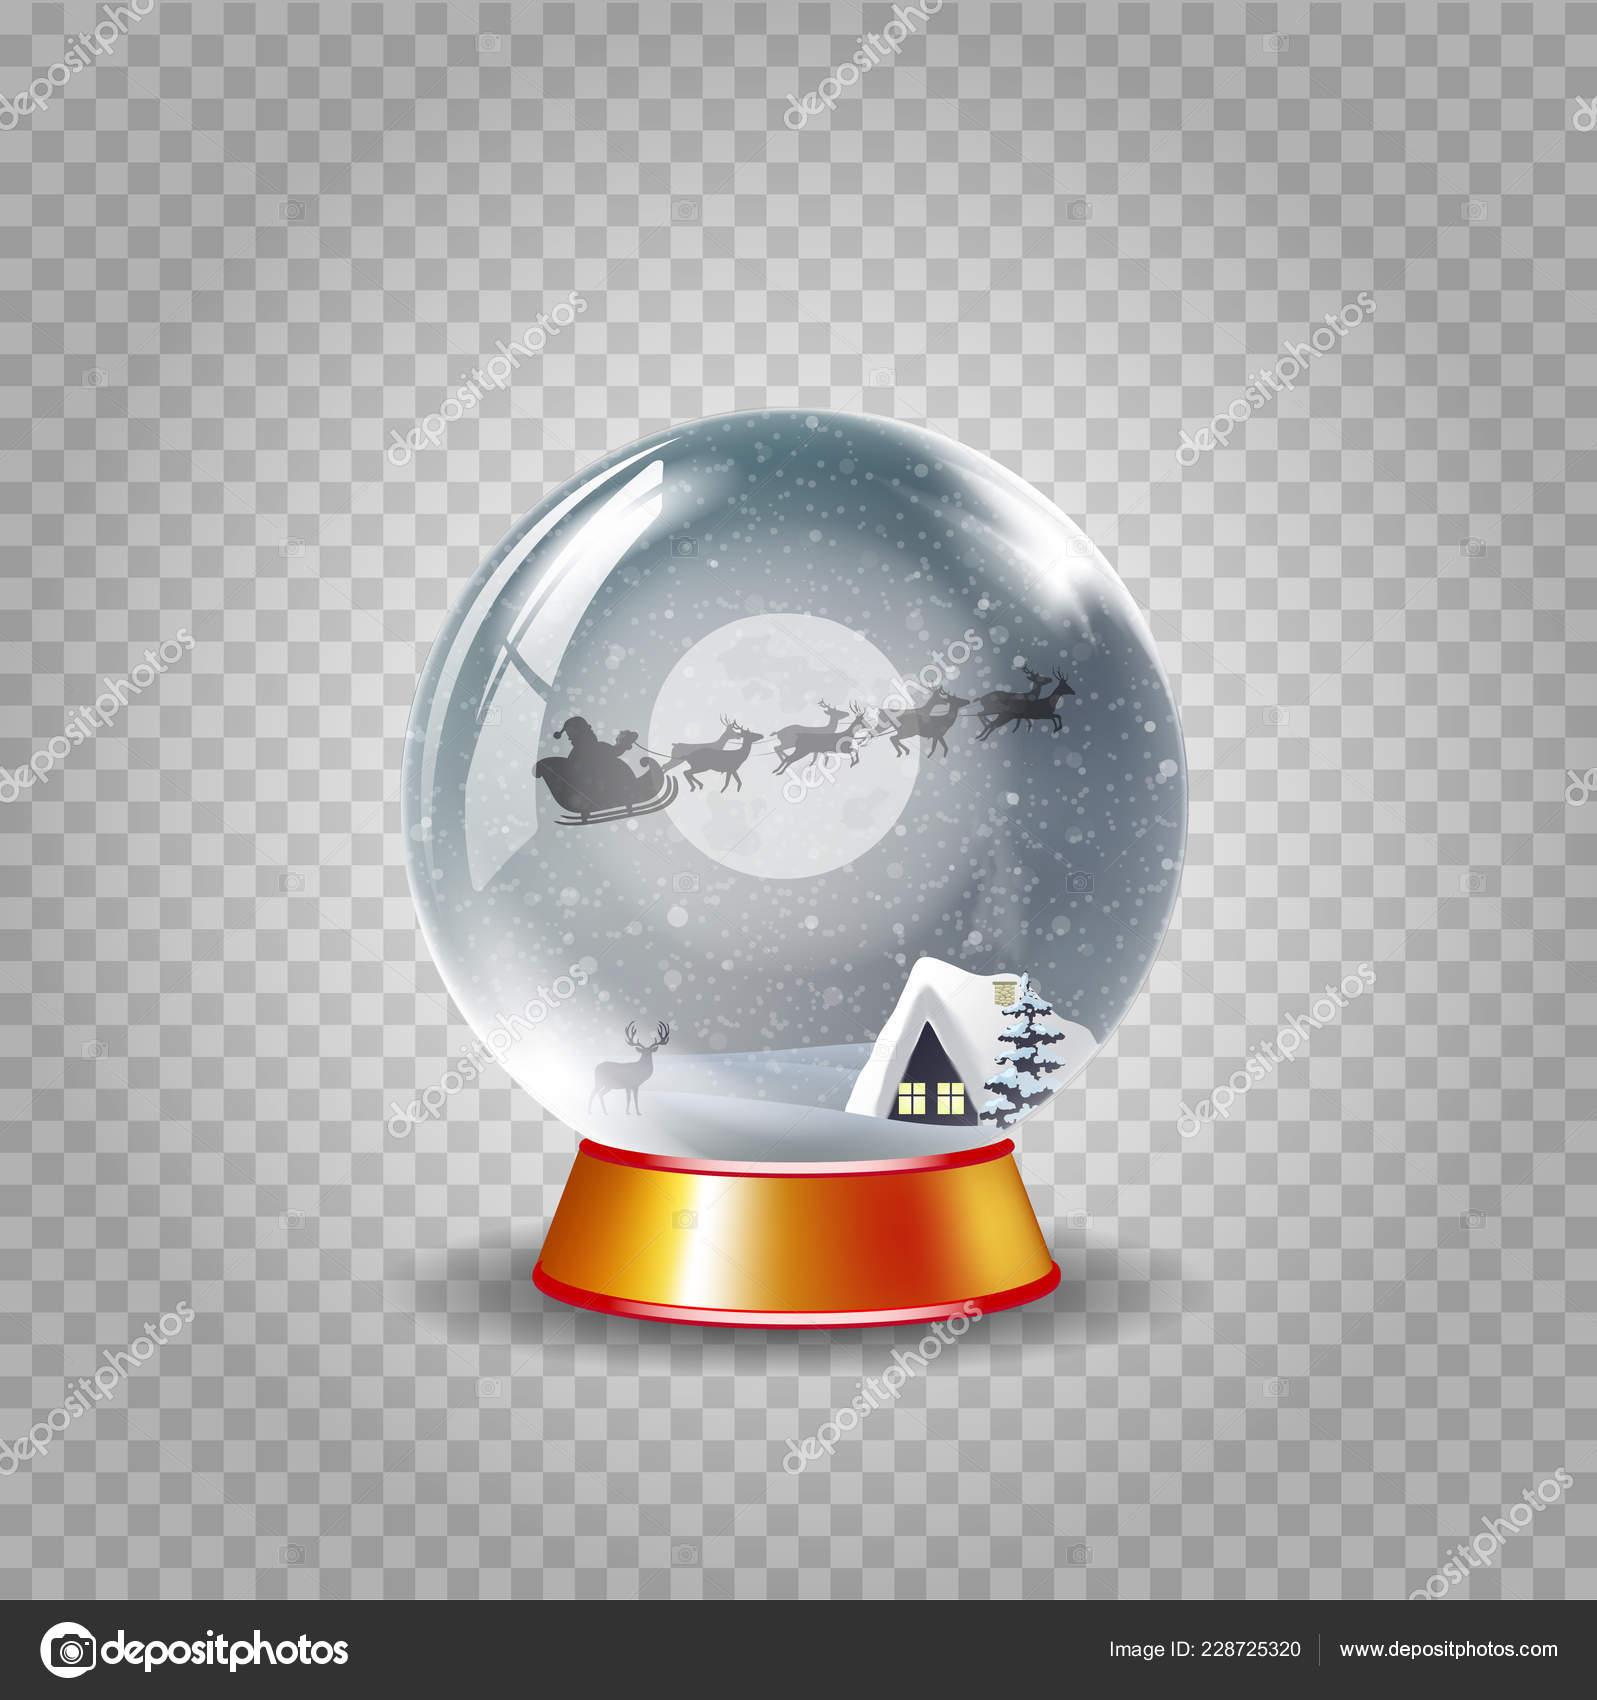 christmas new year crystal snow globe winter snowy night landscape stock vector